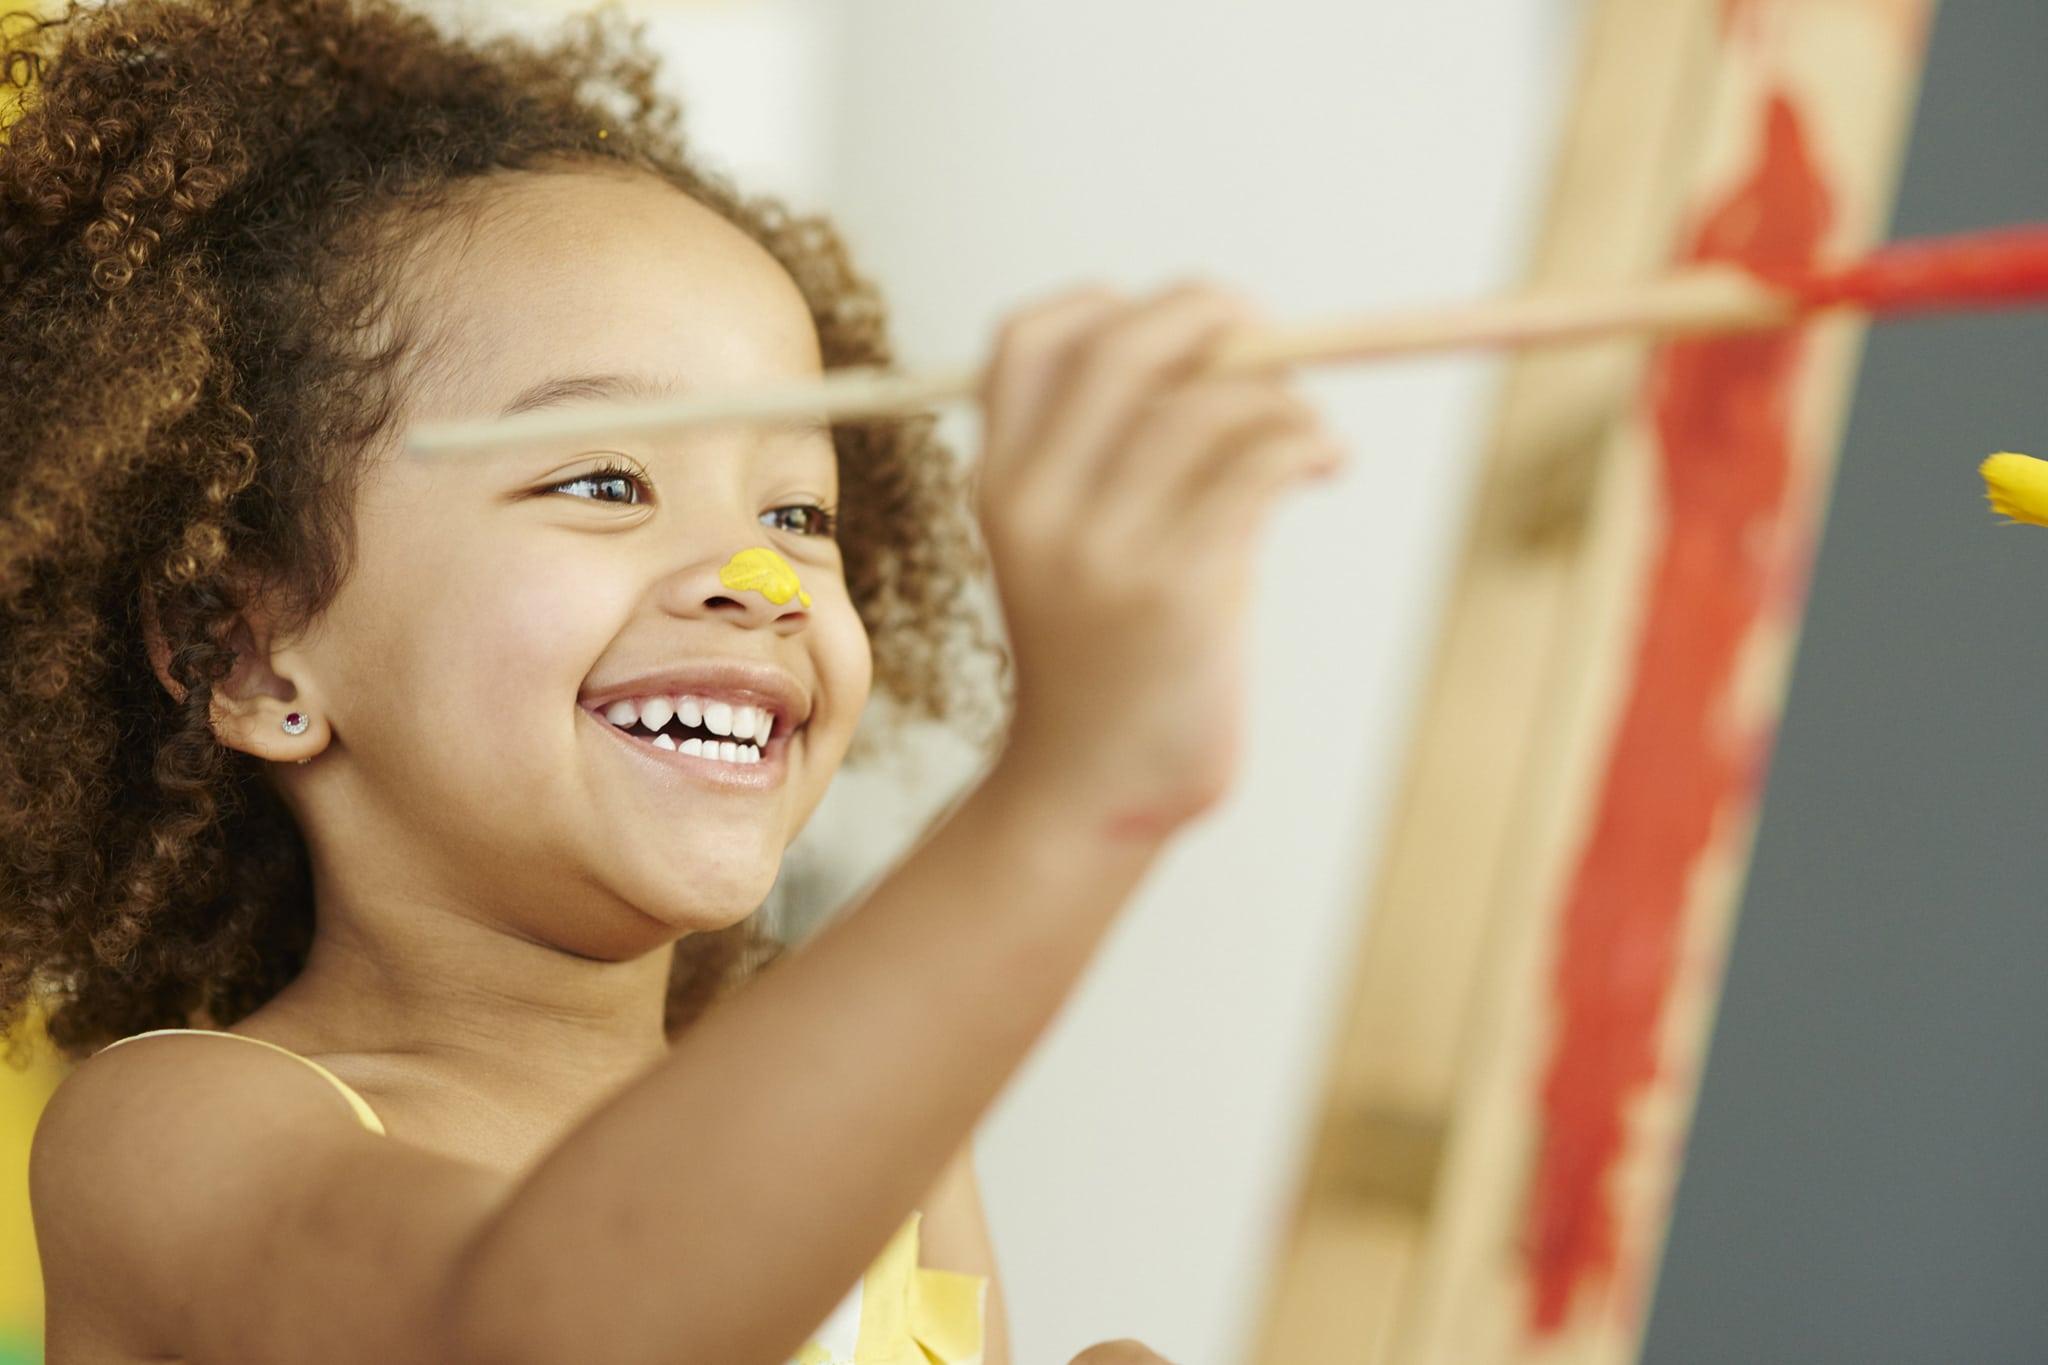 FOTOGRAFIA INFANTIL: LUZ NATURAL E DIREÇĀO, EDUK 2015